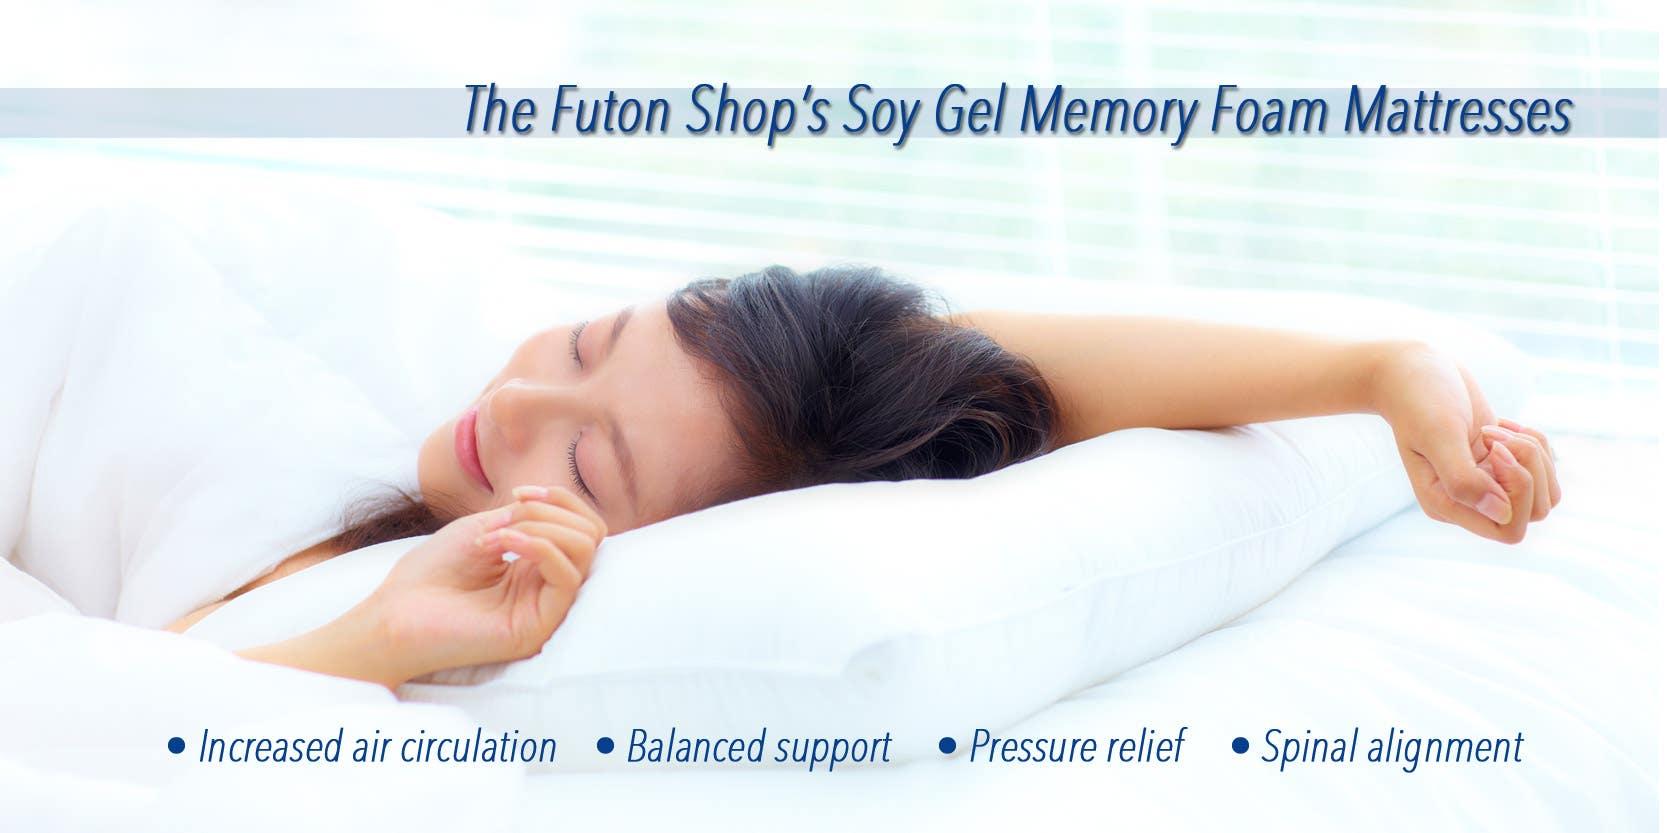 The Futon Shop Gel Memory Foam mattress collection